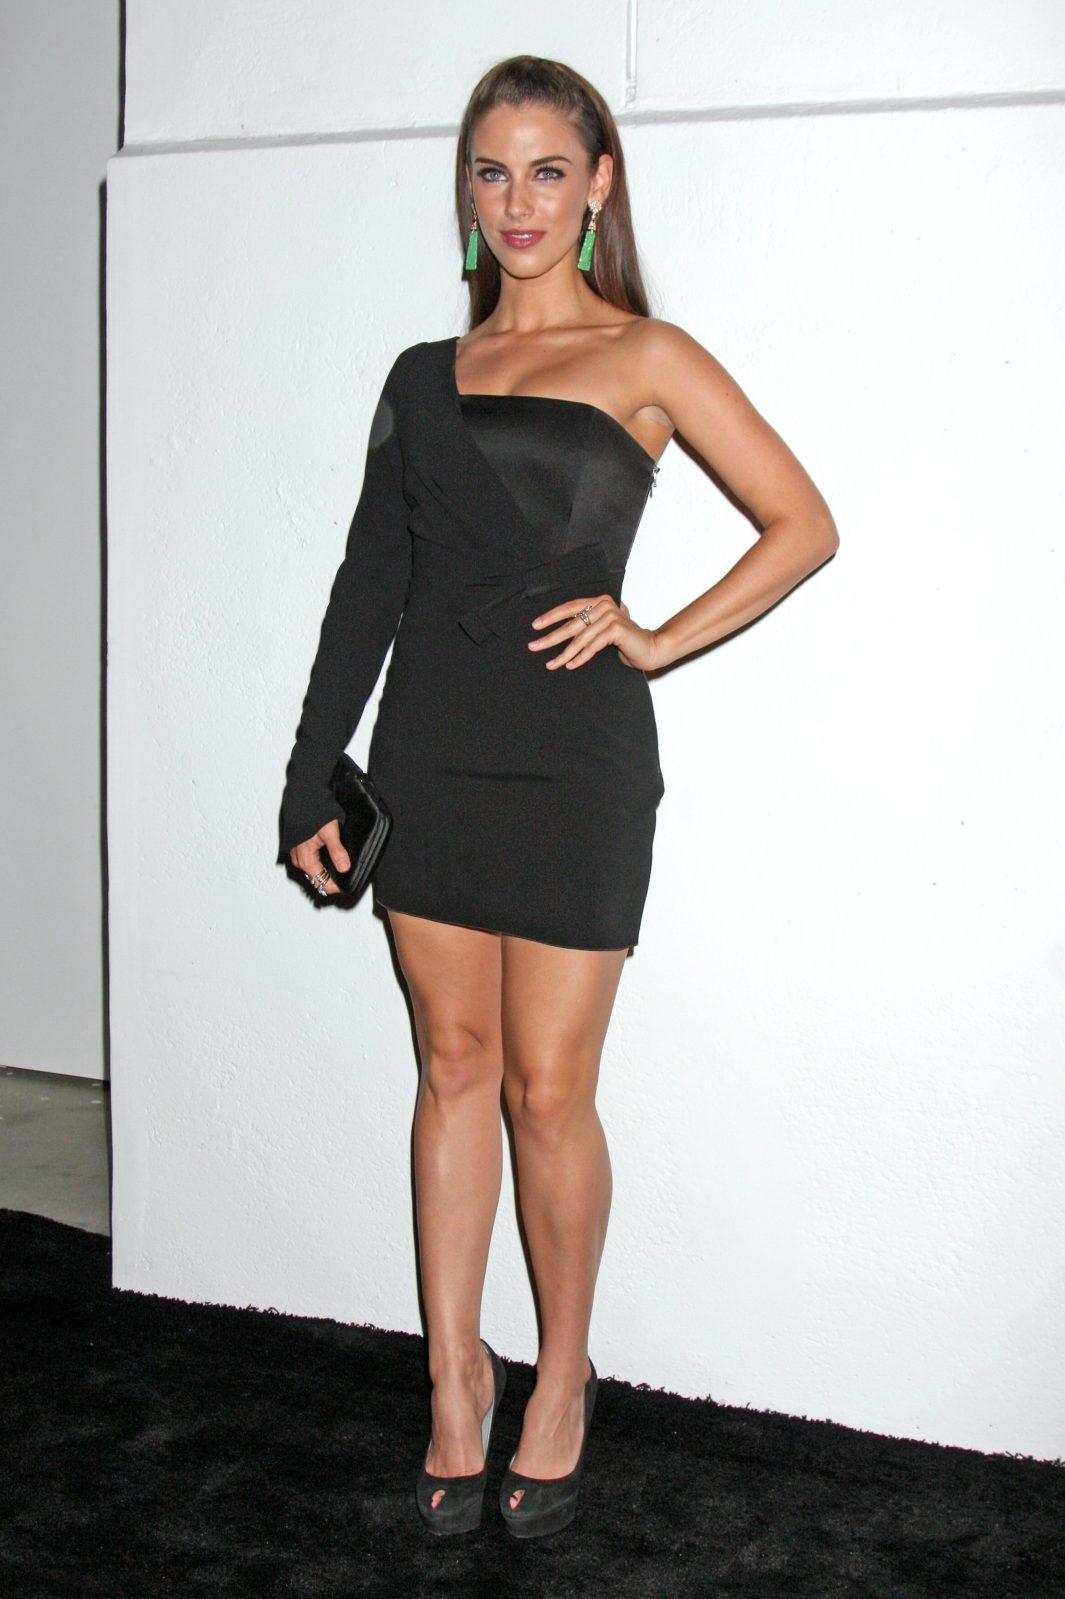 http://2.bp.blogspot.com/_6A8j2EQmANk/THt9mDGsrII/AAAAAAAAKE4/WXepGAUqswI/s1600/Jessica+Lowndes+Is+Looking+Hot+&+Curvacious4.jpg